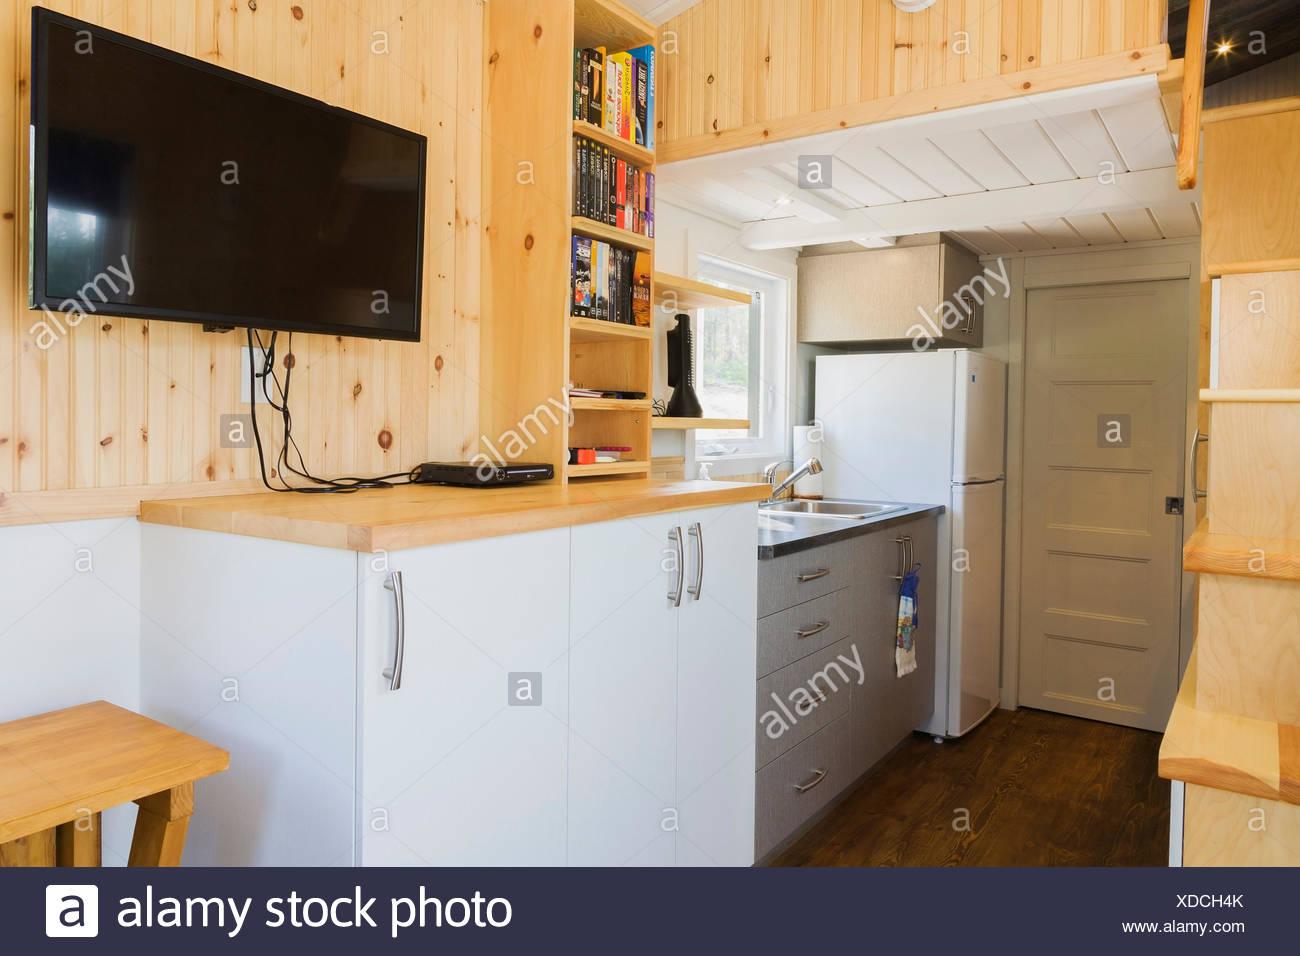 Kitchen Island Foot Closeup On Wooden Floor